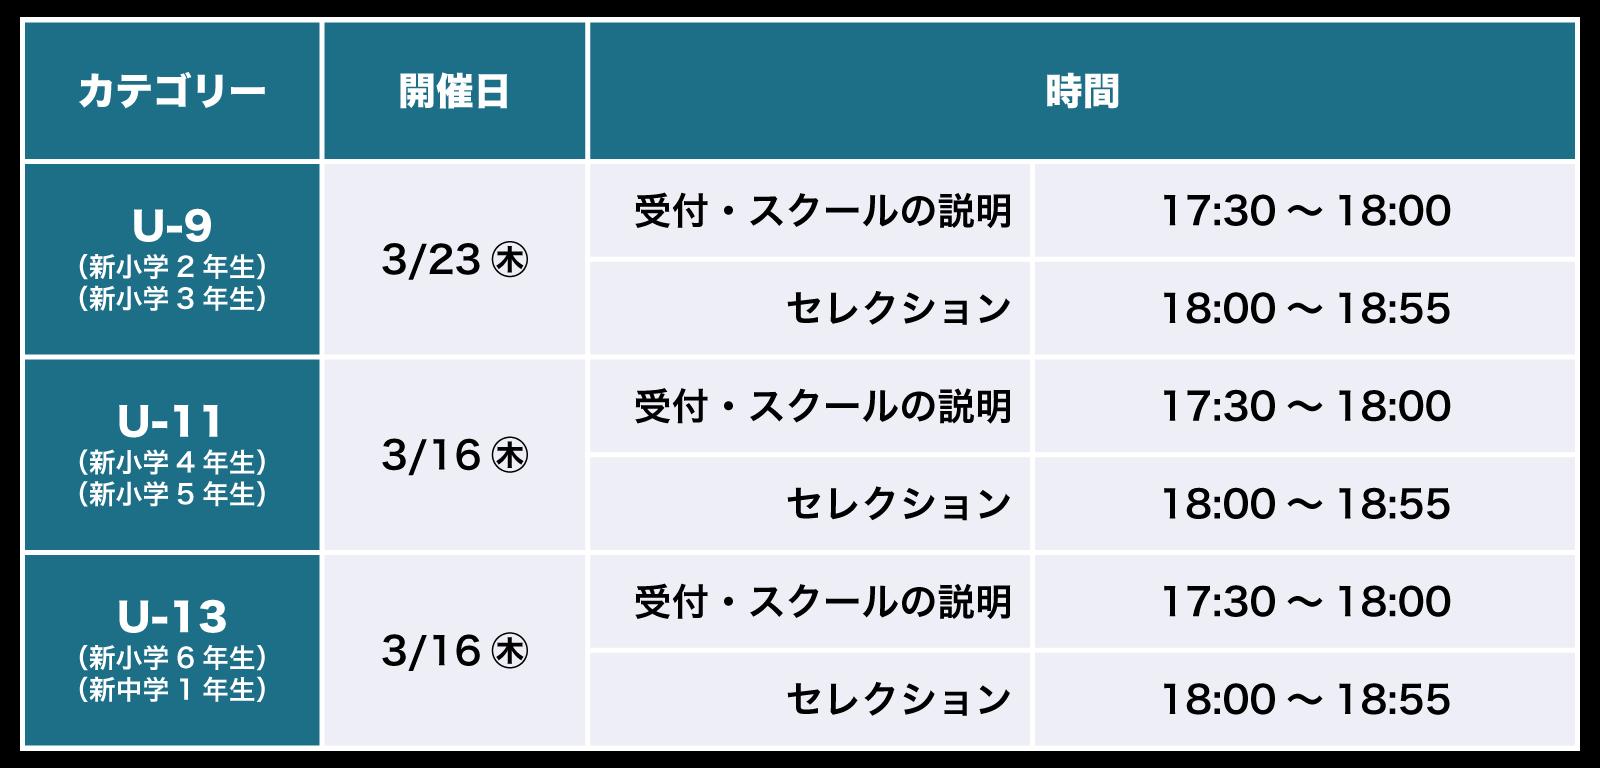 ss_ichikawaselection_v2